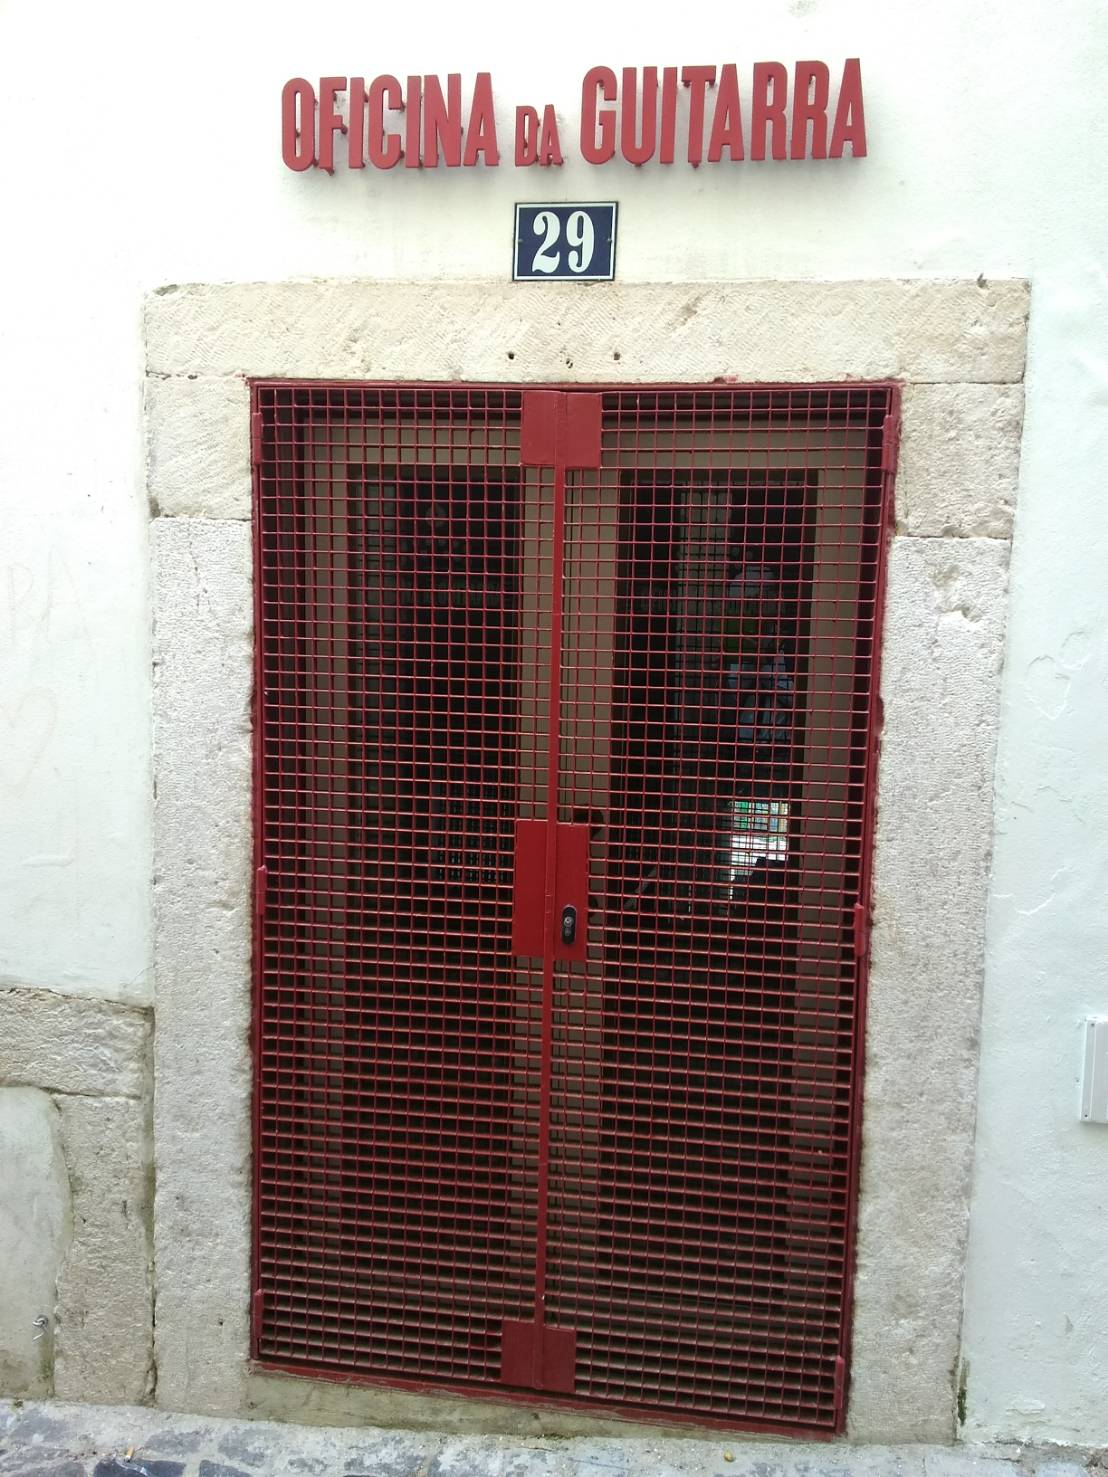 Oficina da Guitarra Portuguesa